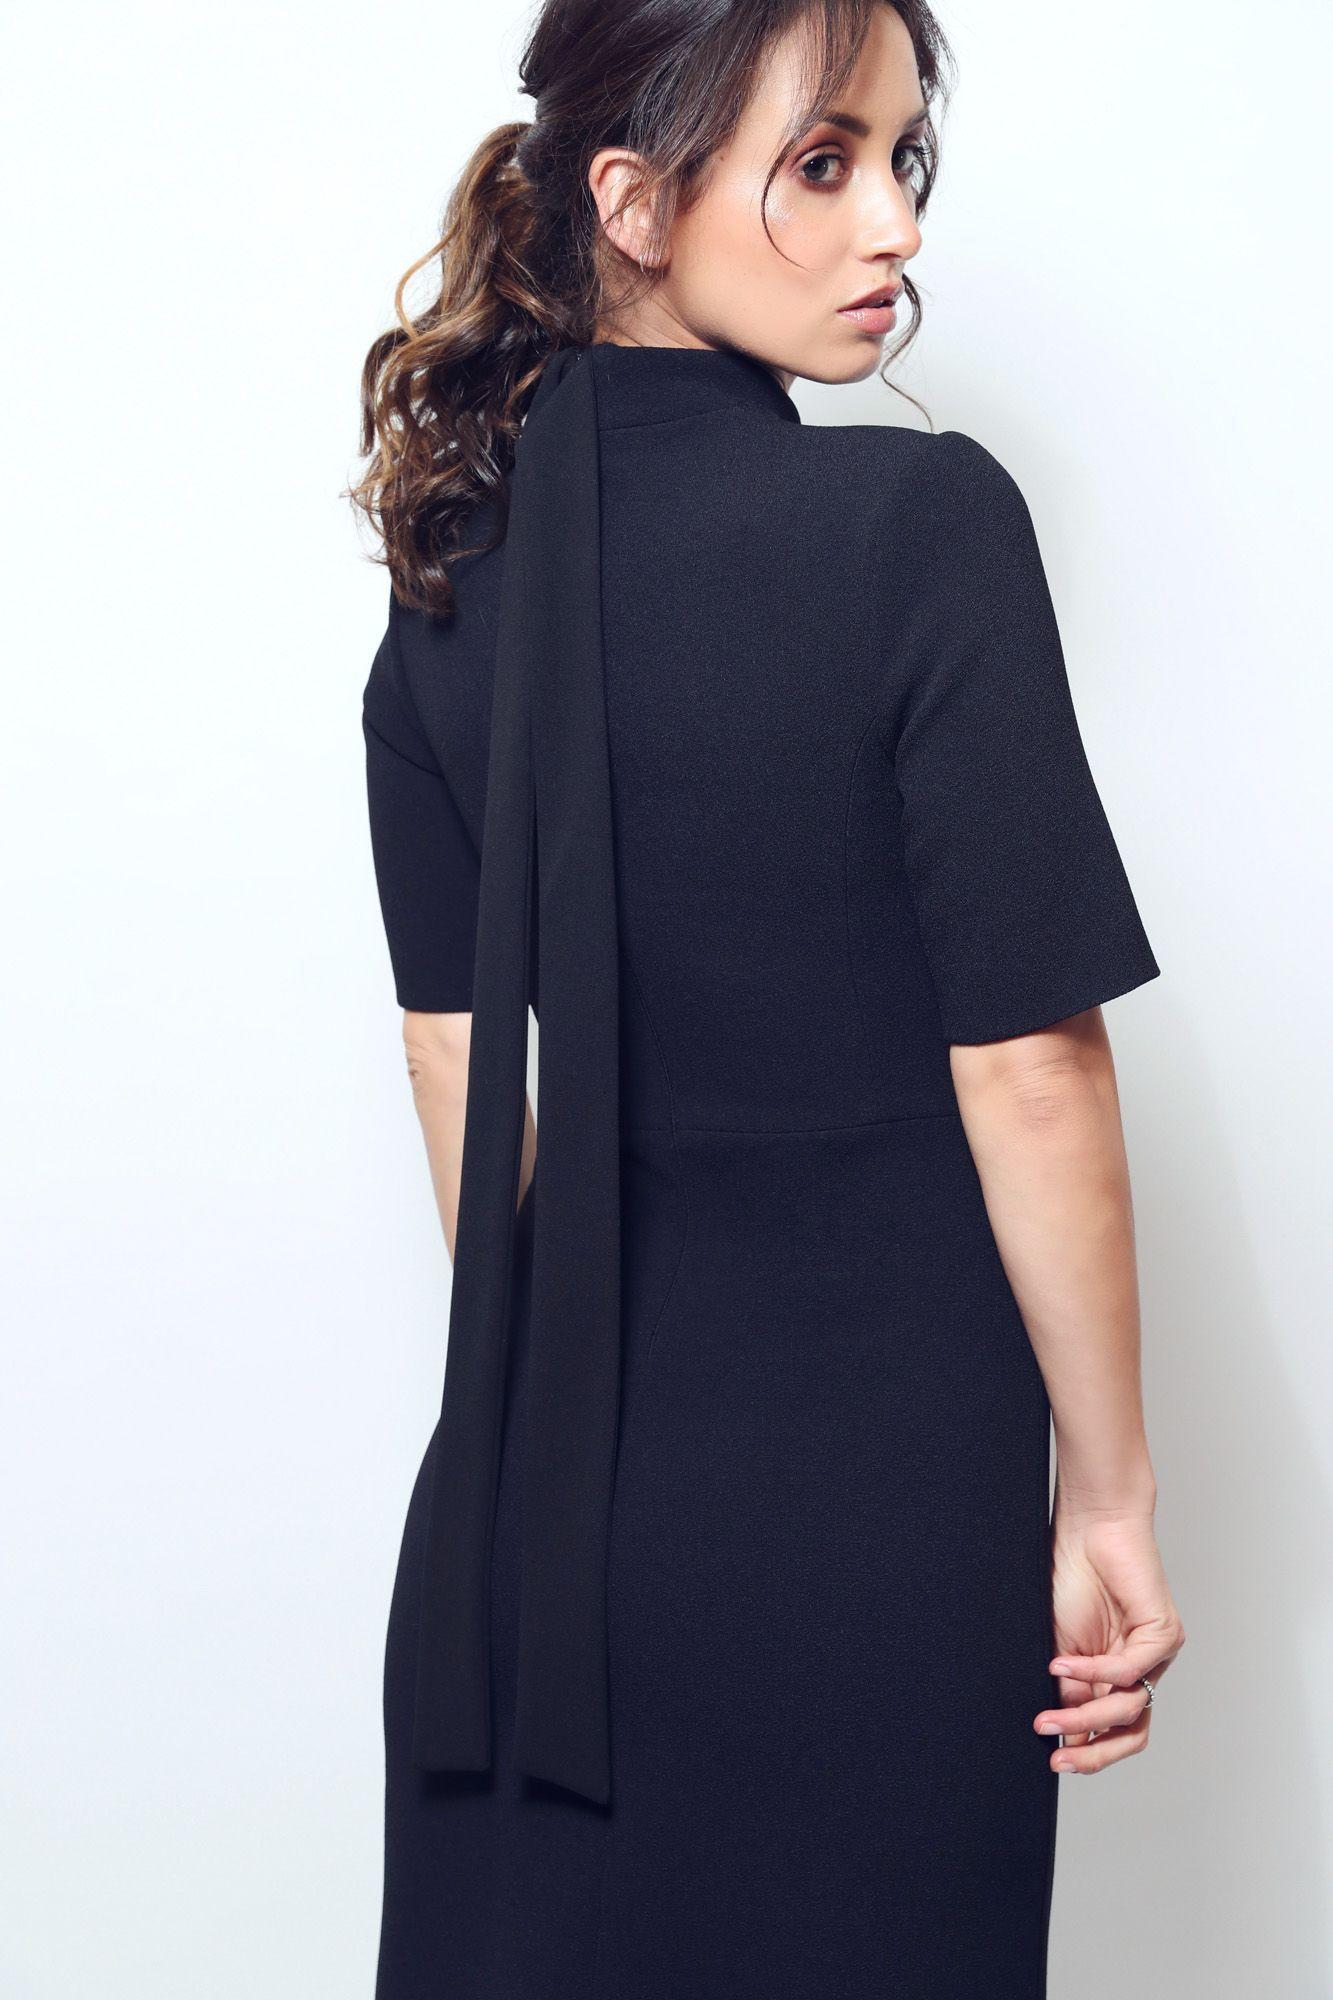 989129c80821 Feme Dress detail. Made-to-order corporate wear by Karen Gee ...